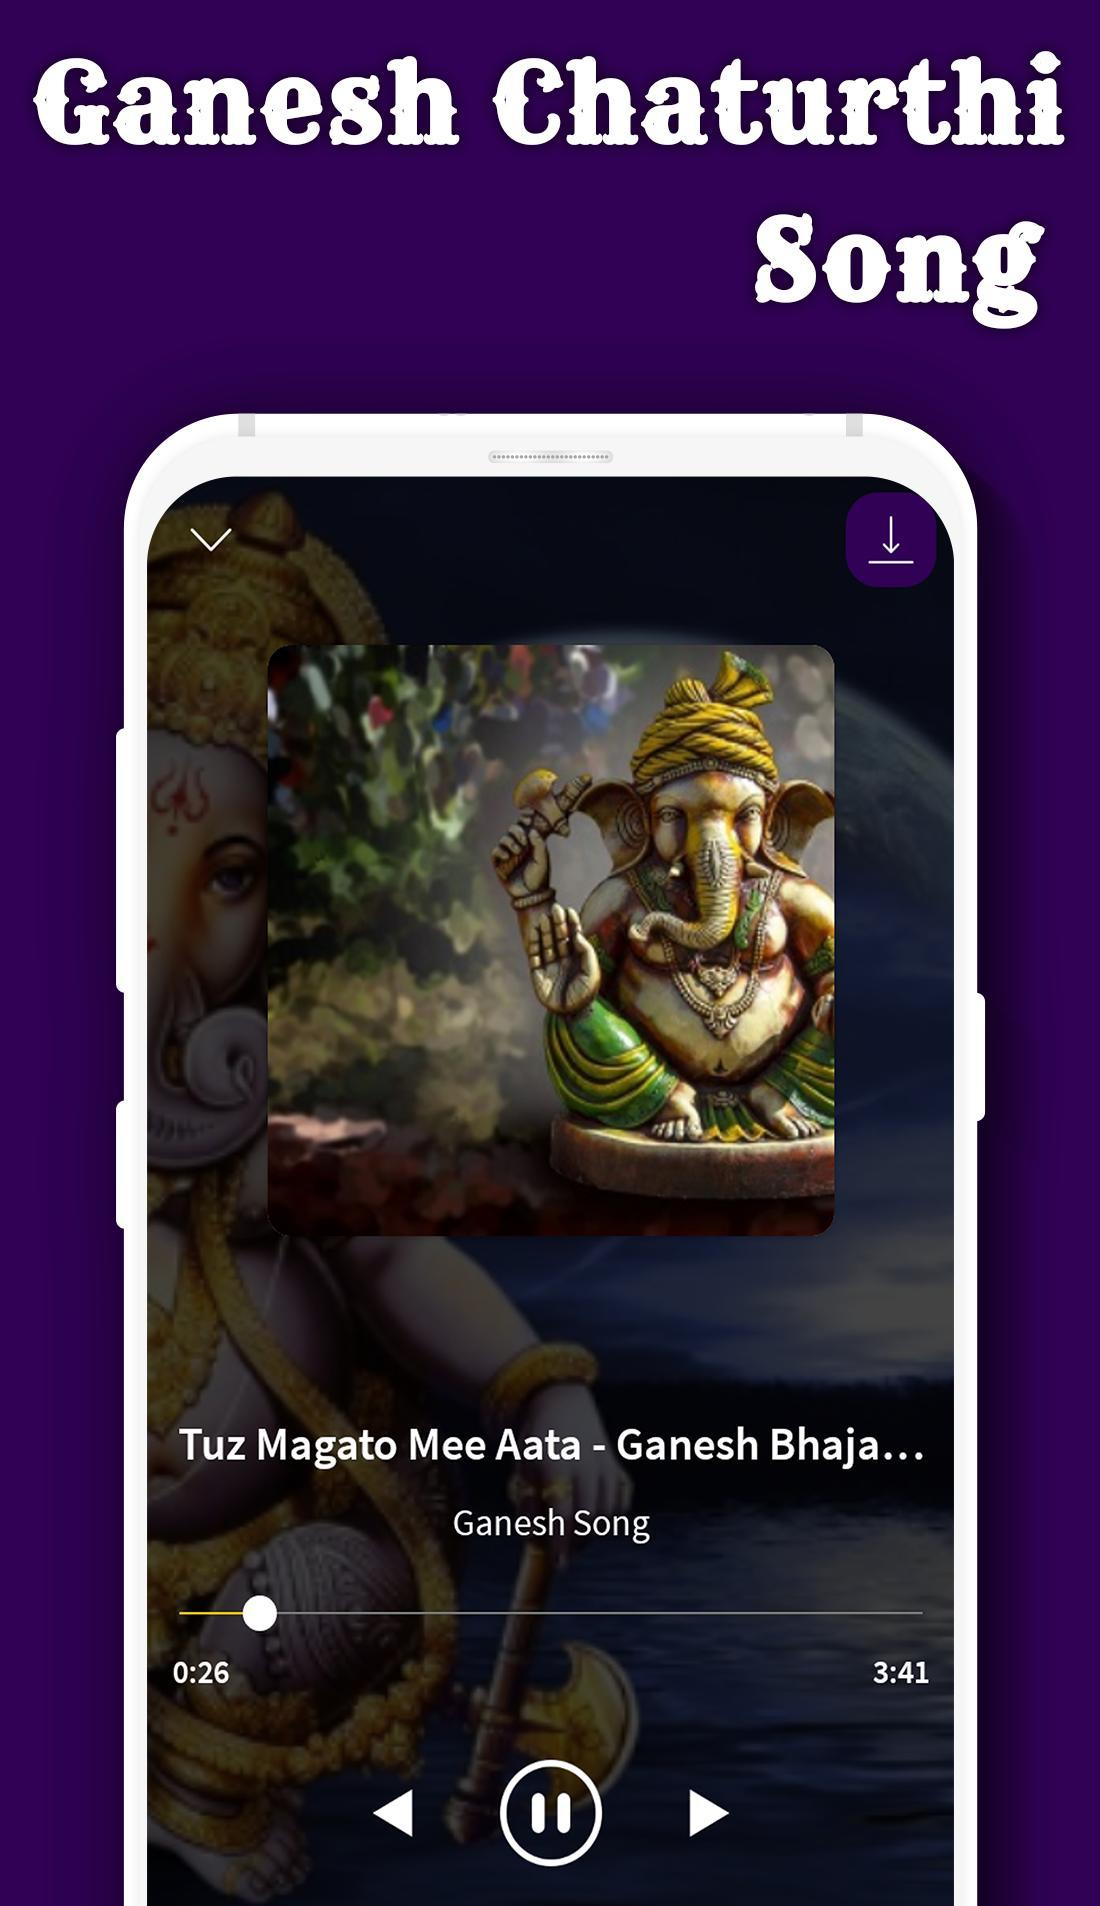 ganpati hindi songs free download mp3 2018